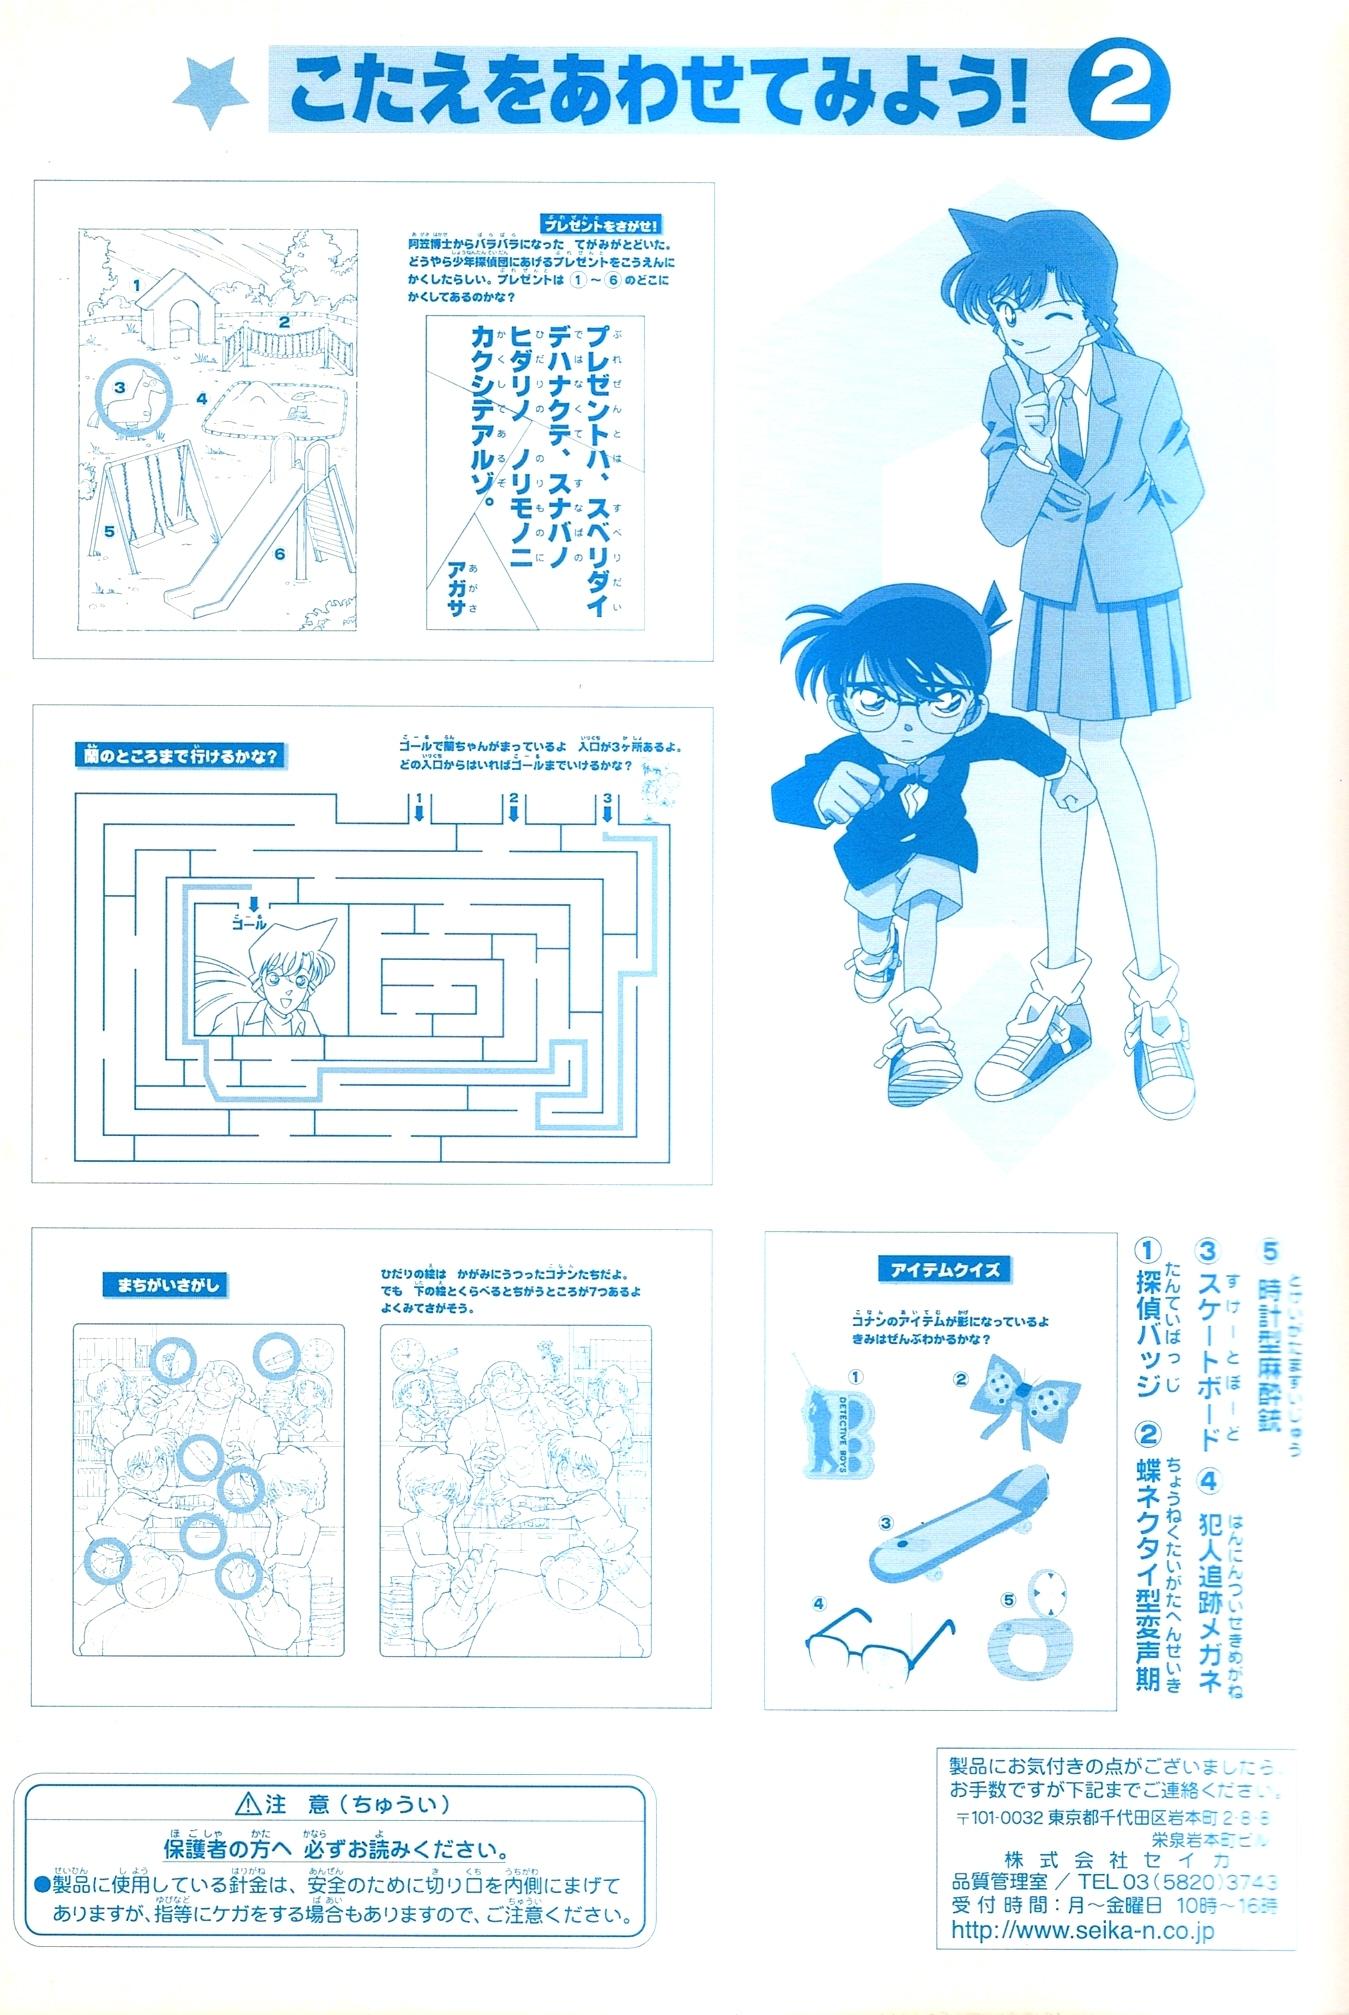 Conan Coloring Conan Coloring Book036 Jpg